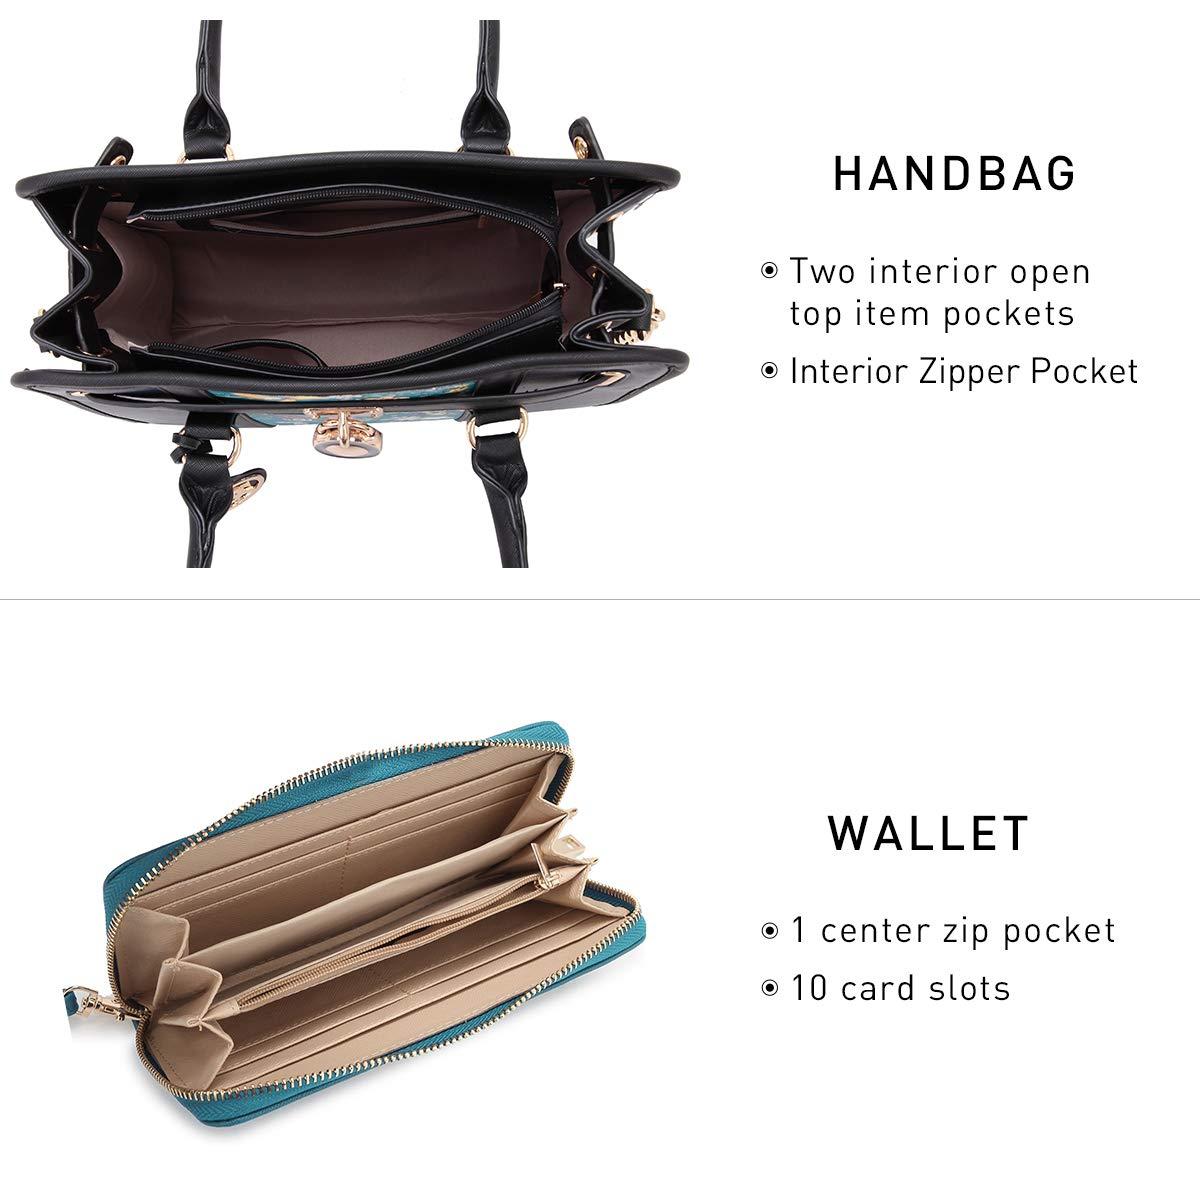 DASEIN Womens Fashion Handbags Shoulder Bag Satchel Purse Tote Top Handle Work Bag 2pcs Set for Ladies Women KC-XL-12-7103-W-LPD//BK-FN-FBA